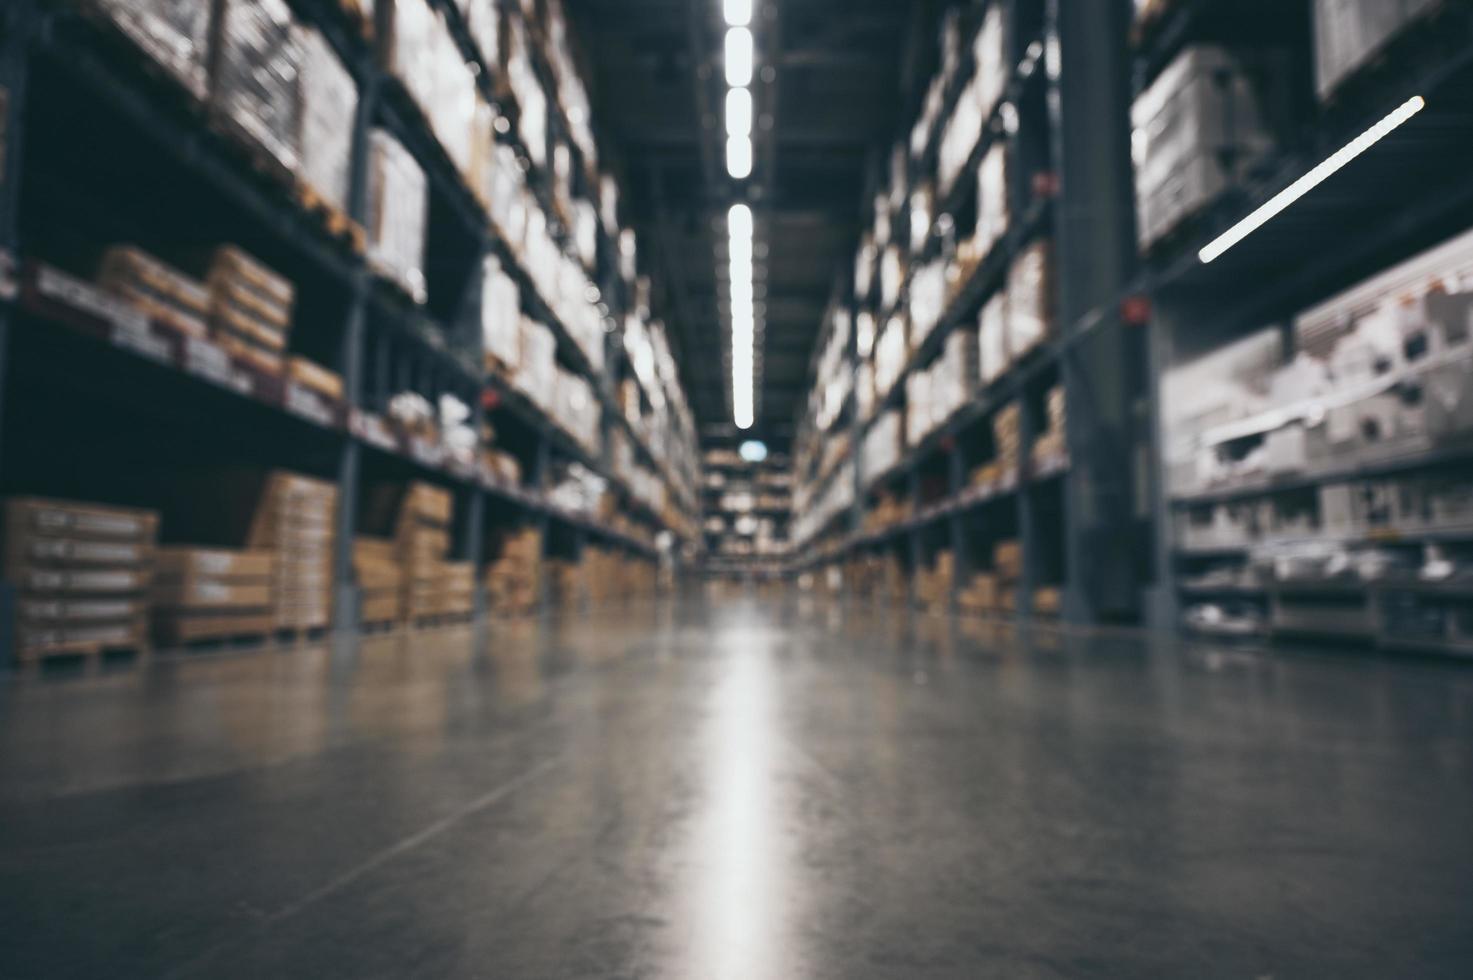 Aisle of warehouse photo